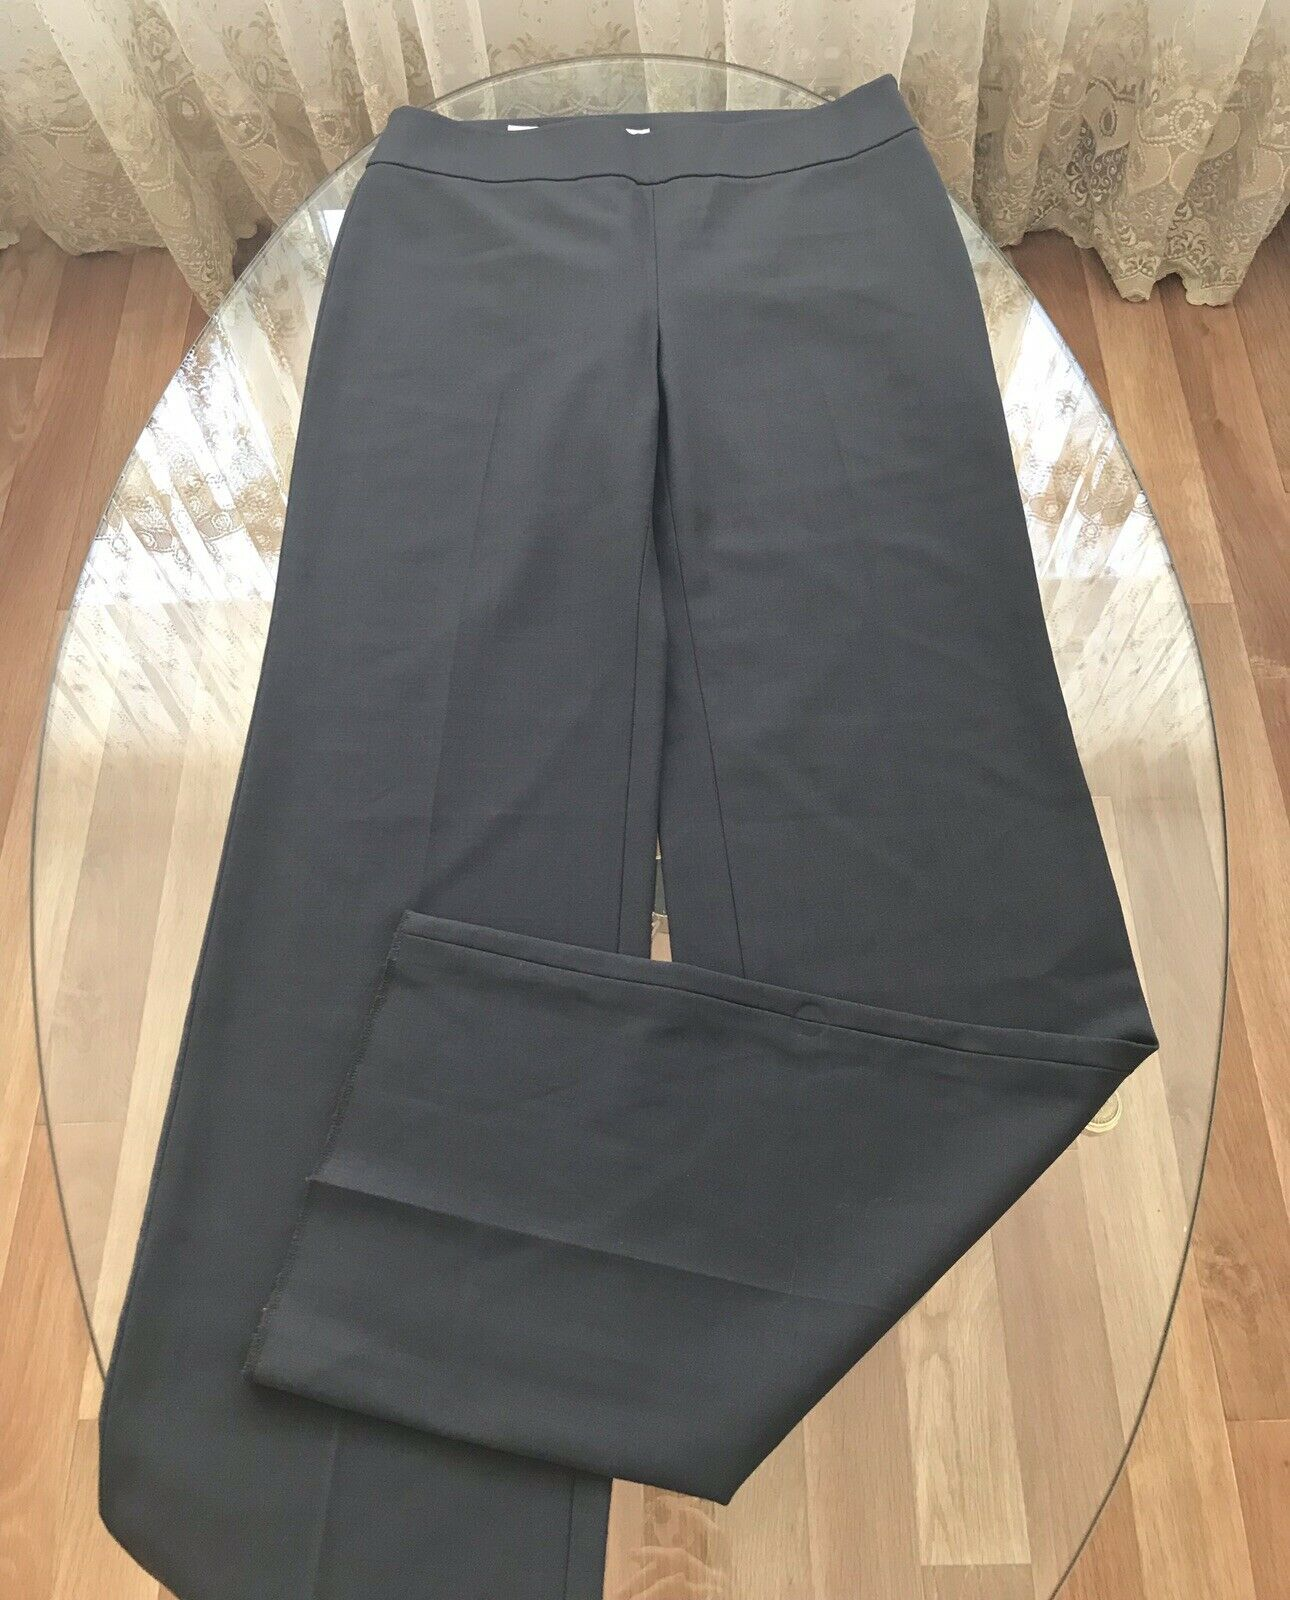 Armani pantalones damas de lana talla 46 L  nuevo  100% autentico